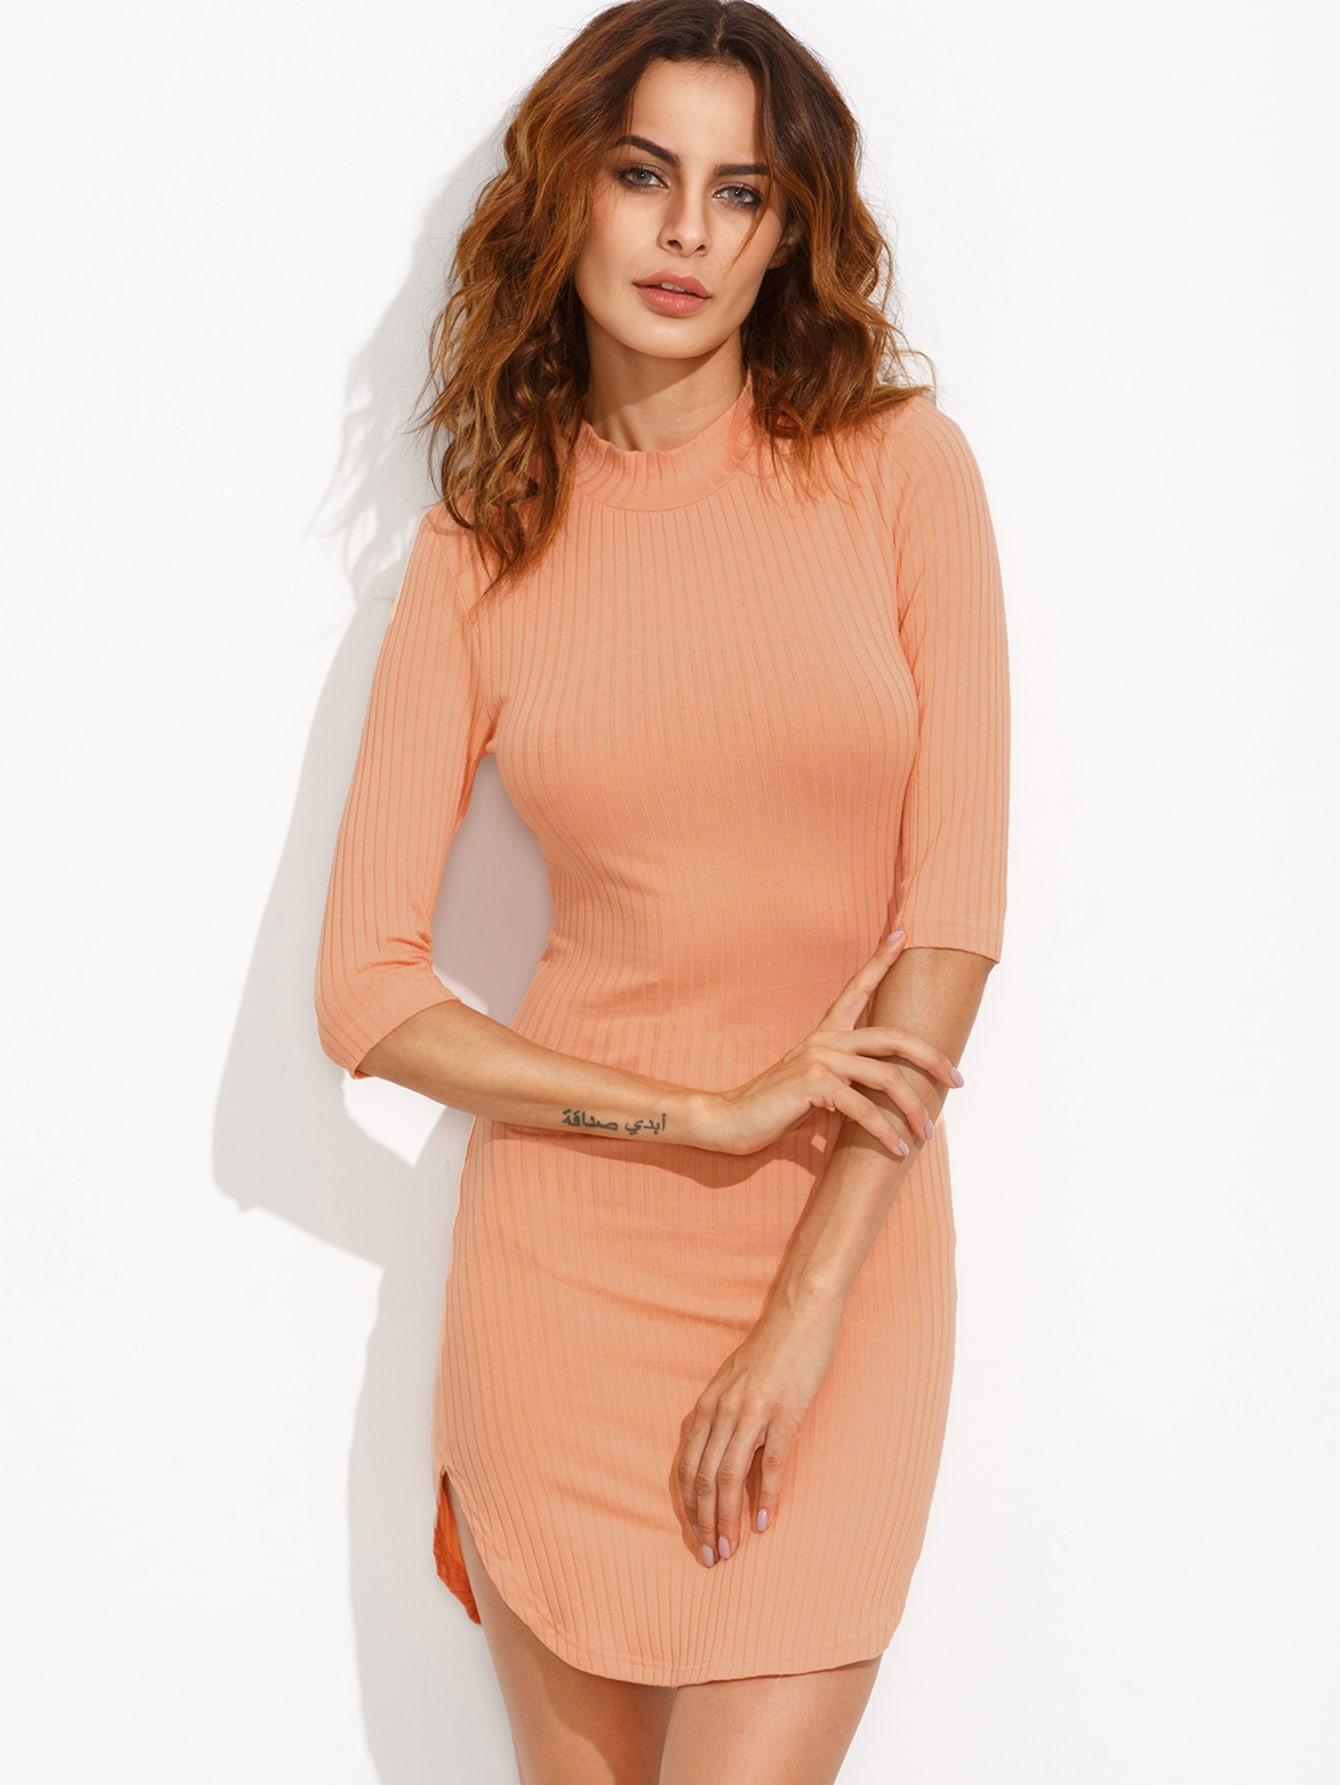 Orange Mock Neck Curved Hem Ribbed Sheath Dress dress160811707